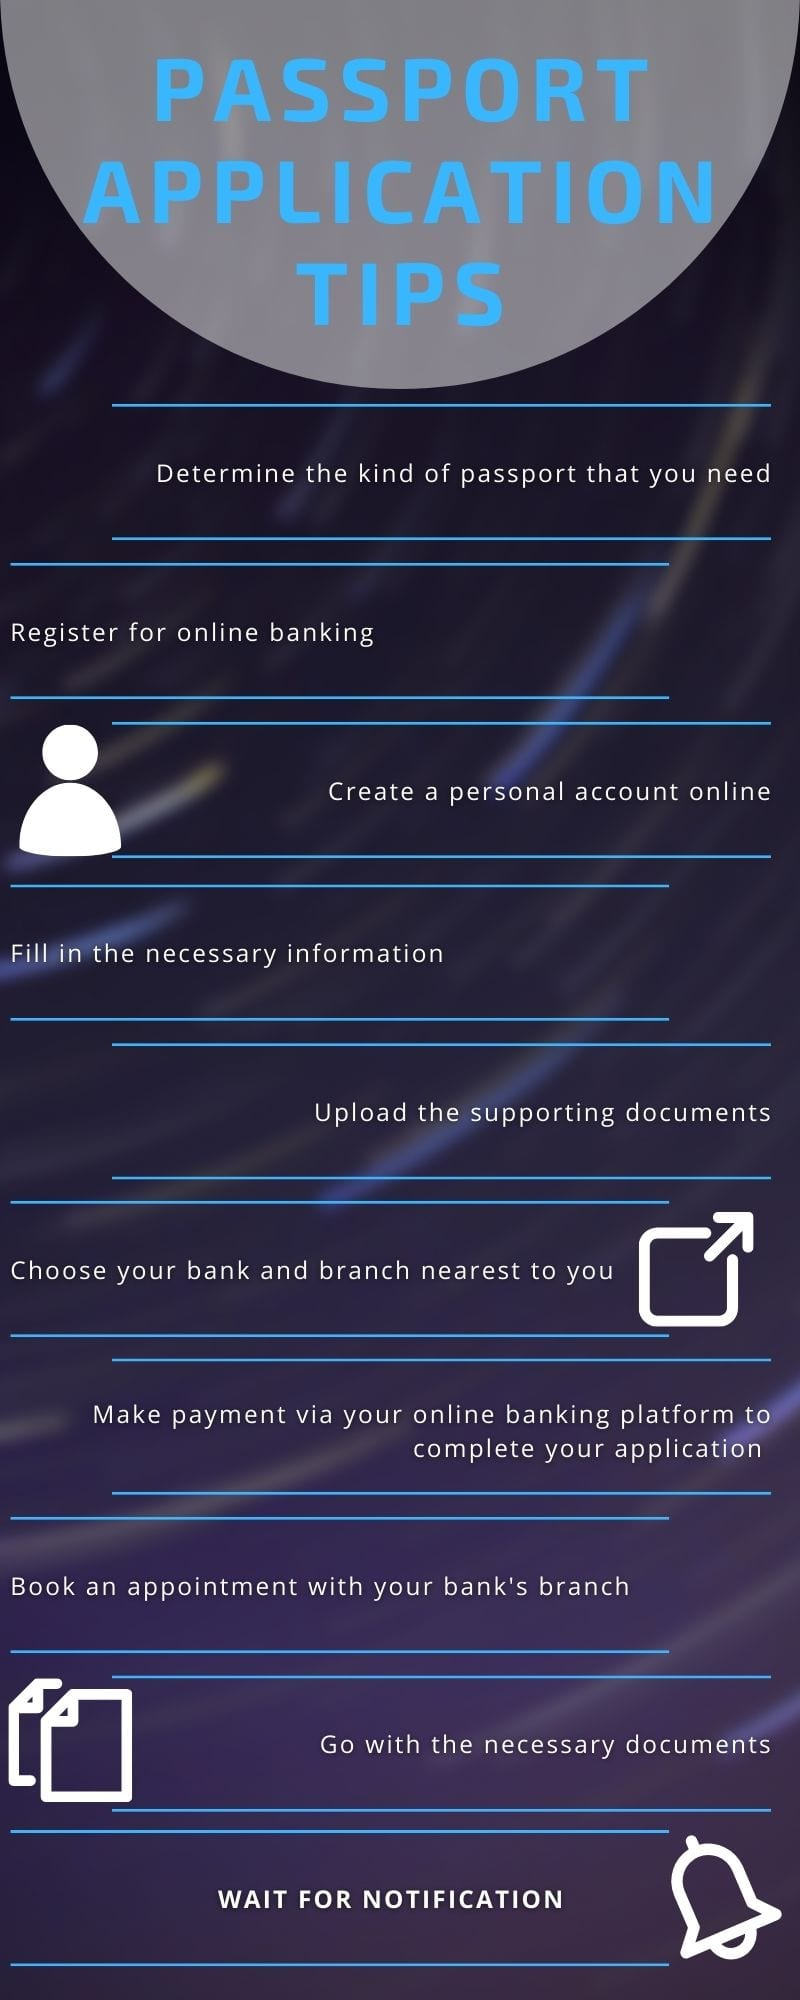 Passport application at banks